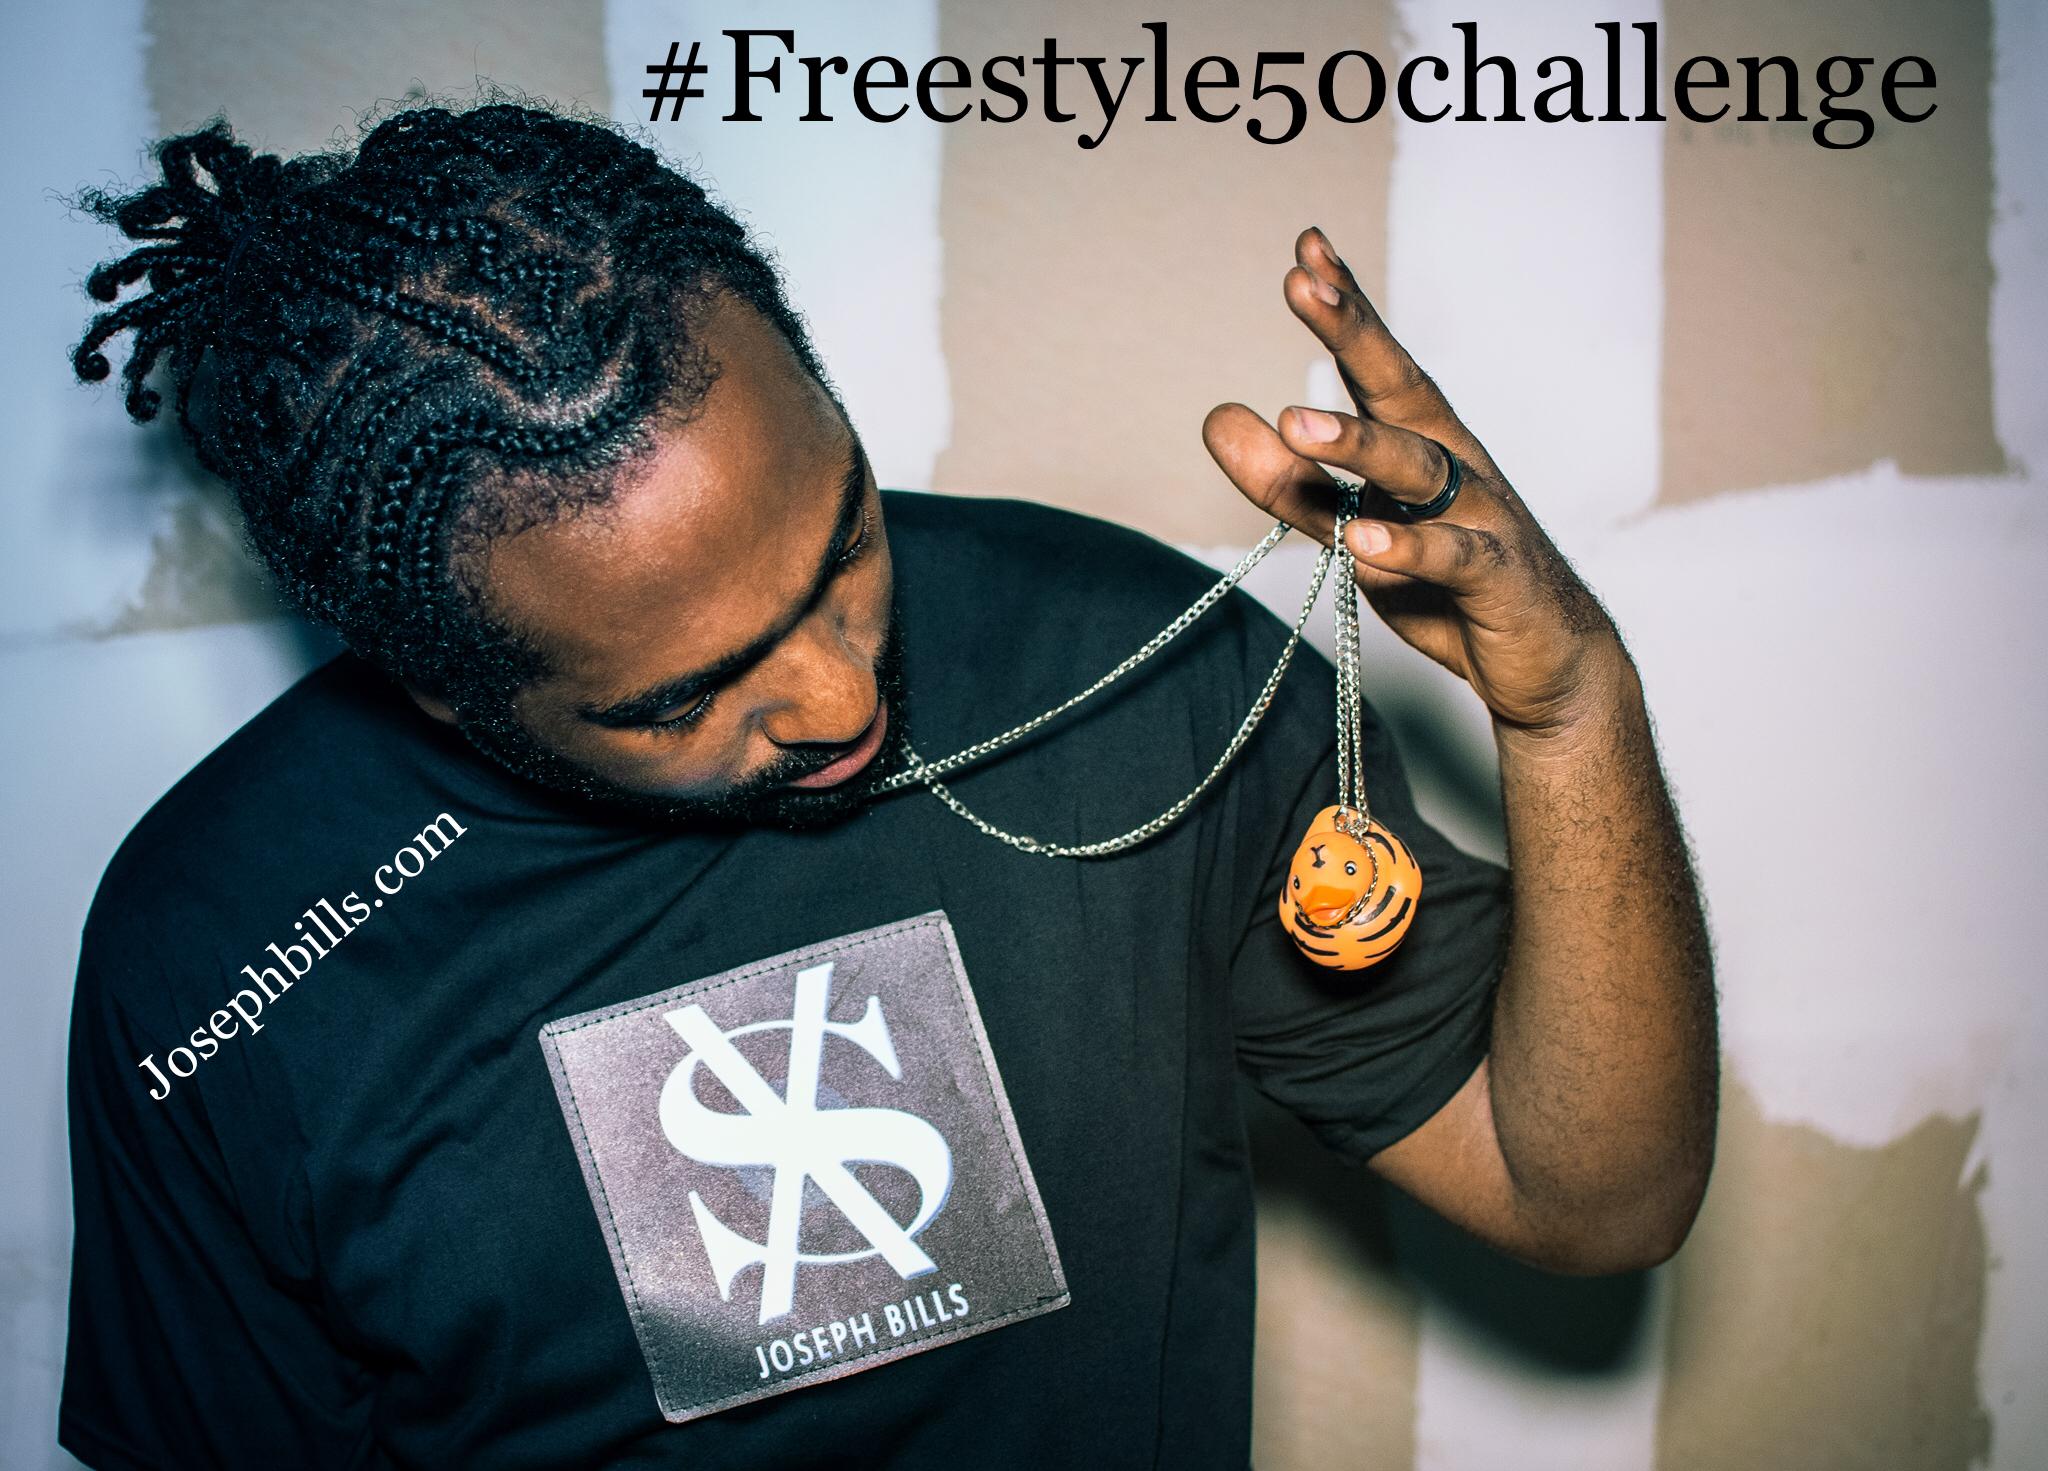 New Video: Joseph Bills – 50 Challenge Freestyle | @josephbills